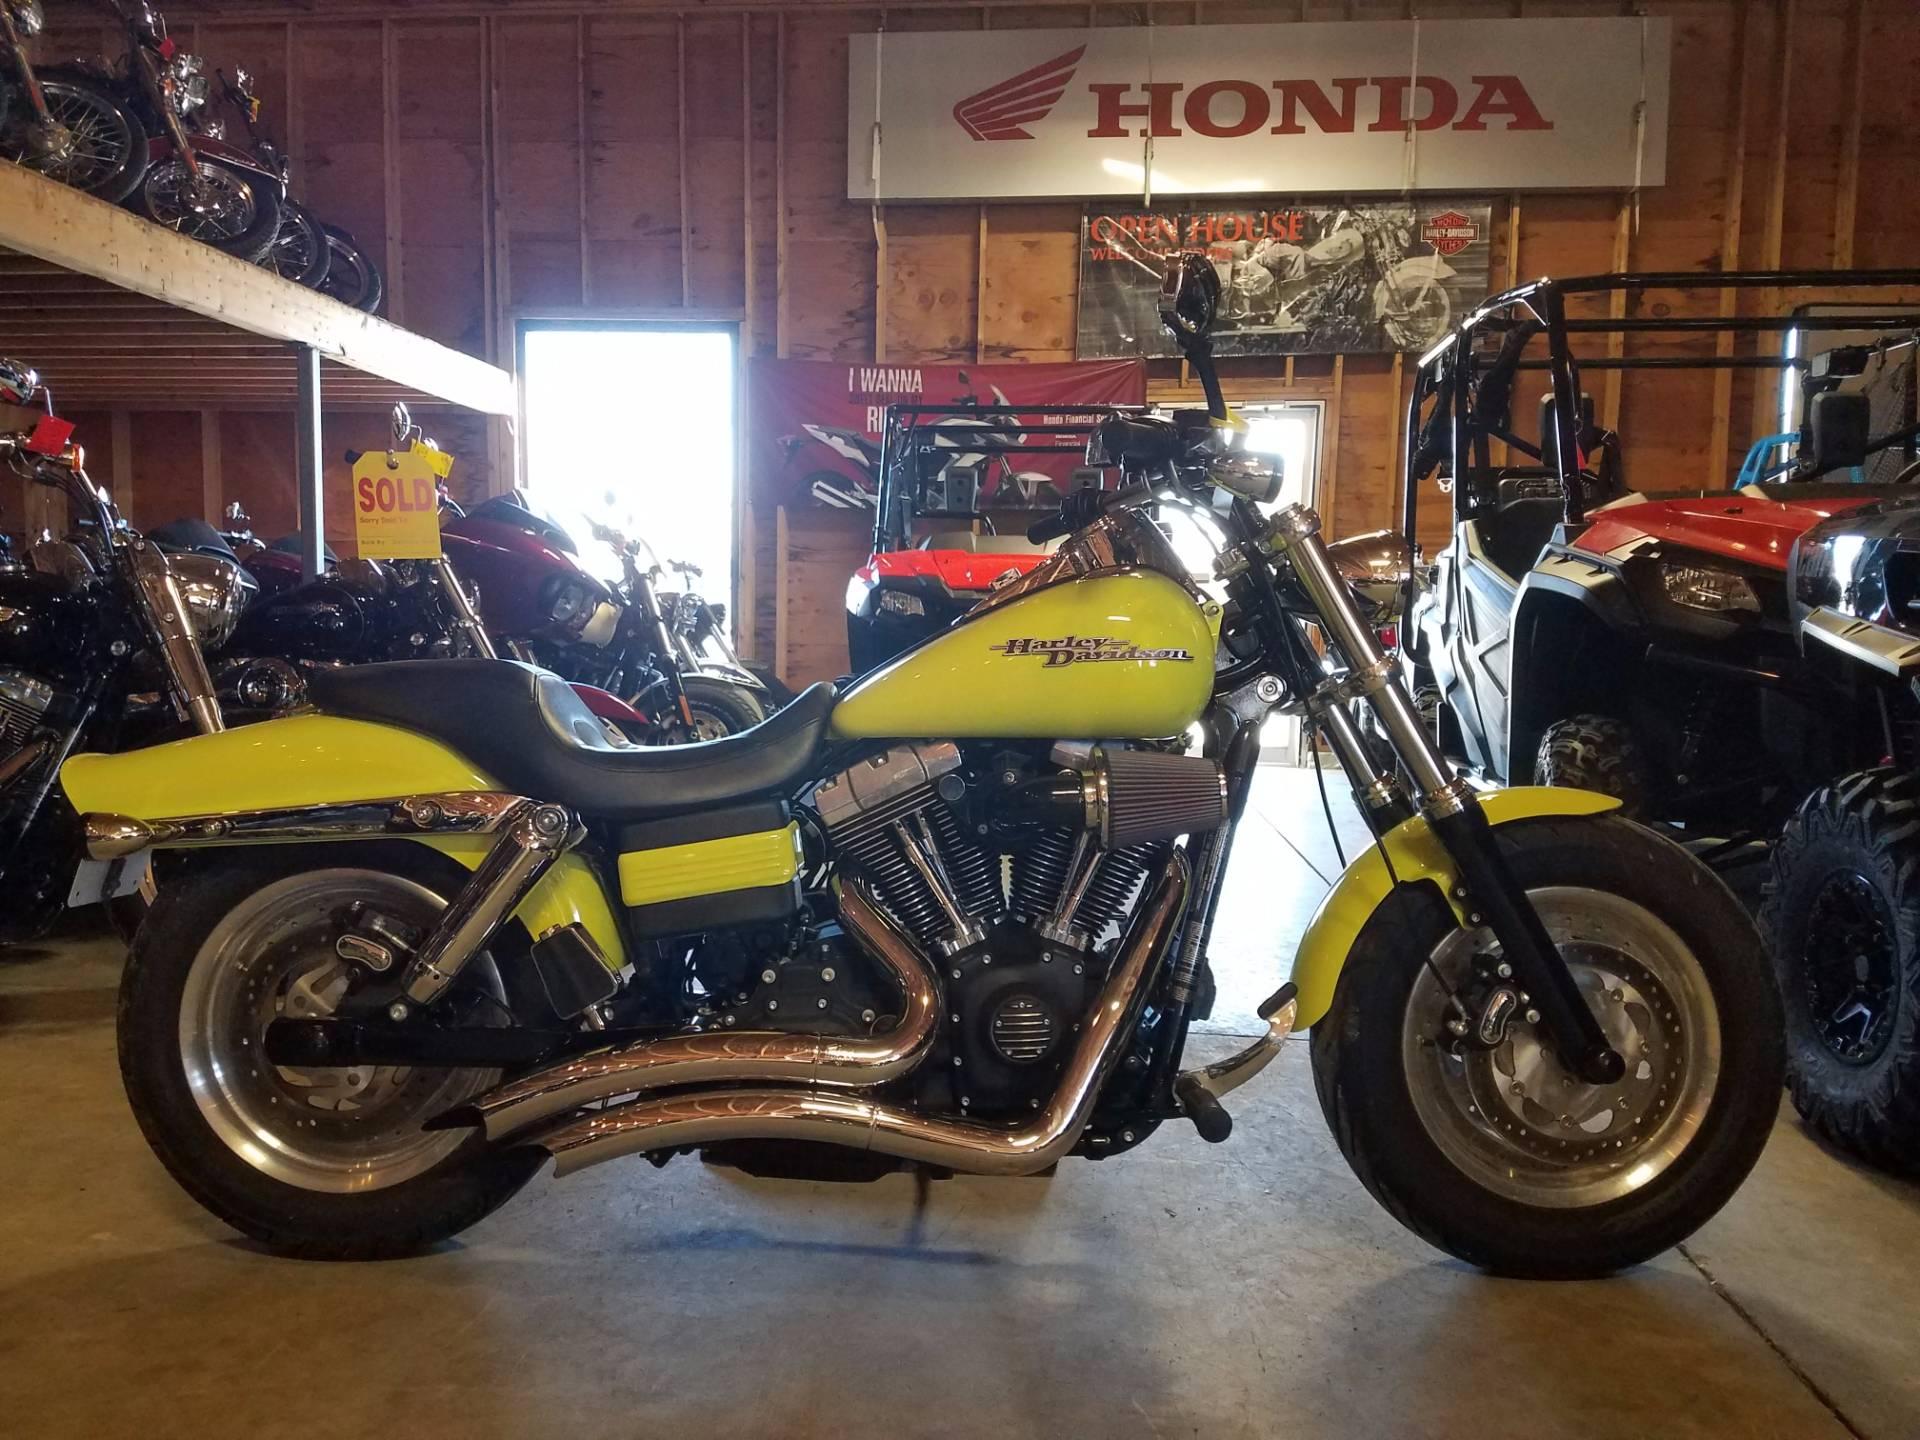 2012 harley davidson dyna fat bob motorcycles augusta maine 5314. Black Bedroom Furniture Sets. Home Design Ideas